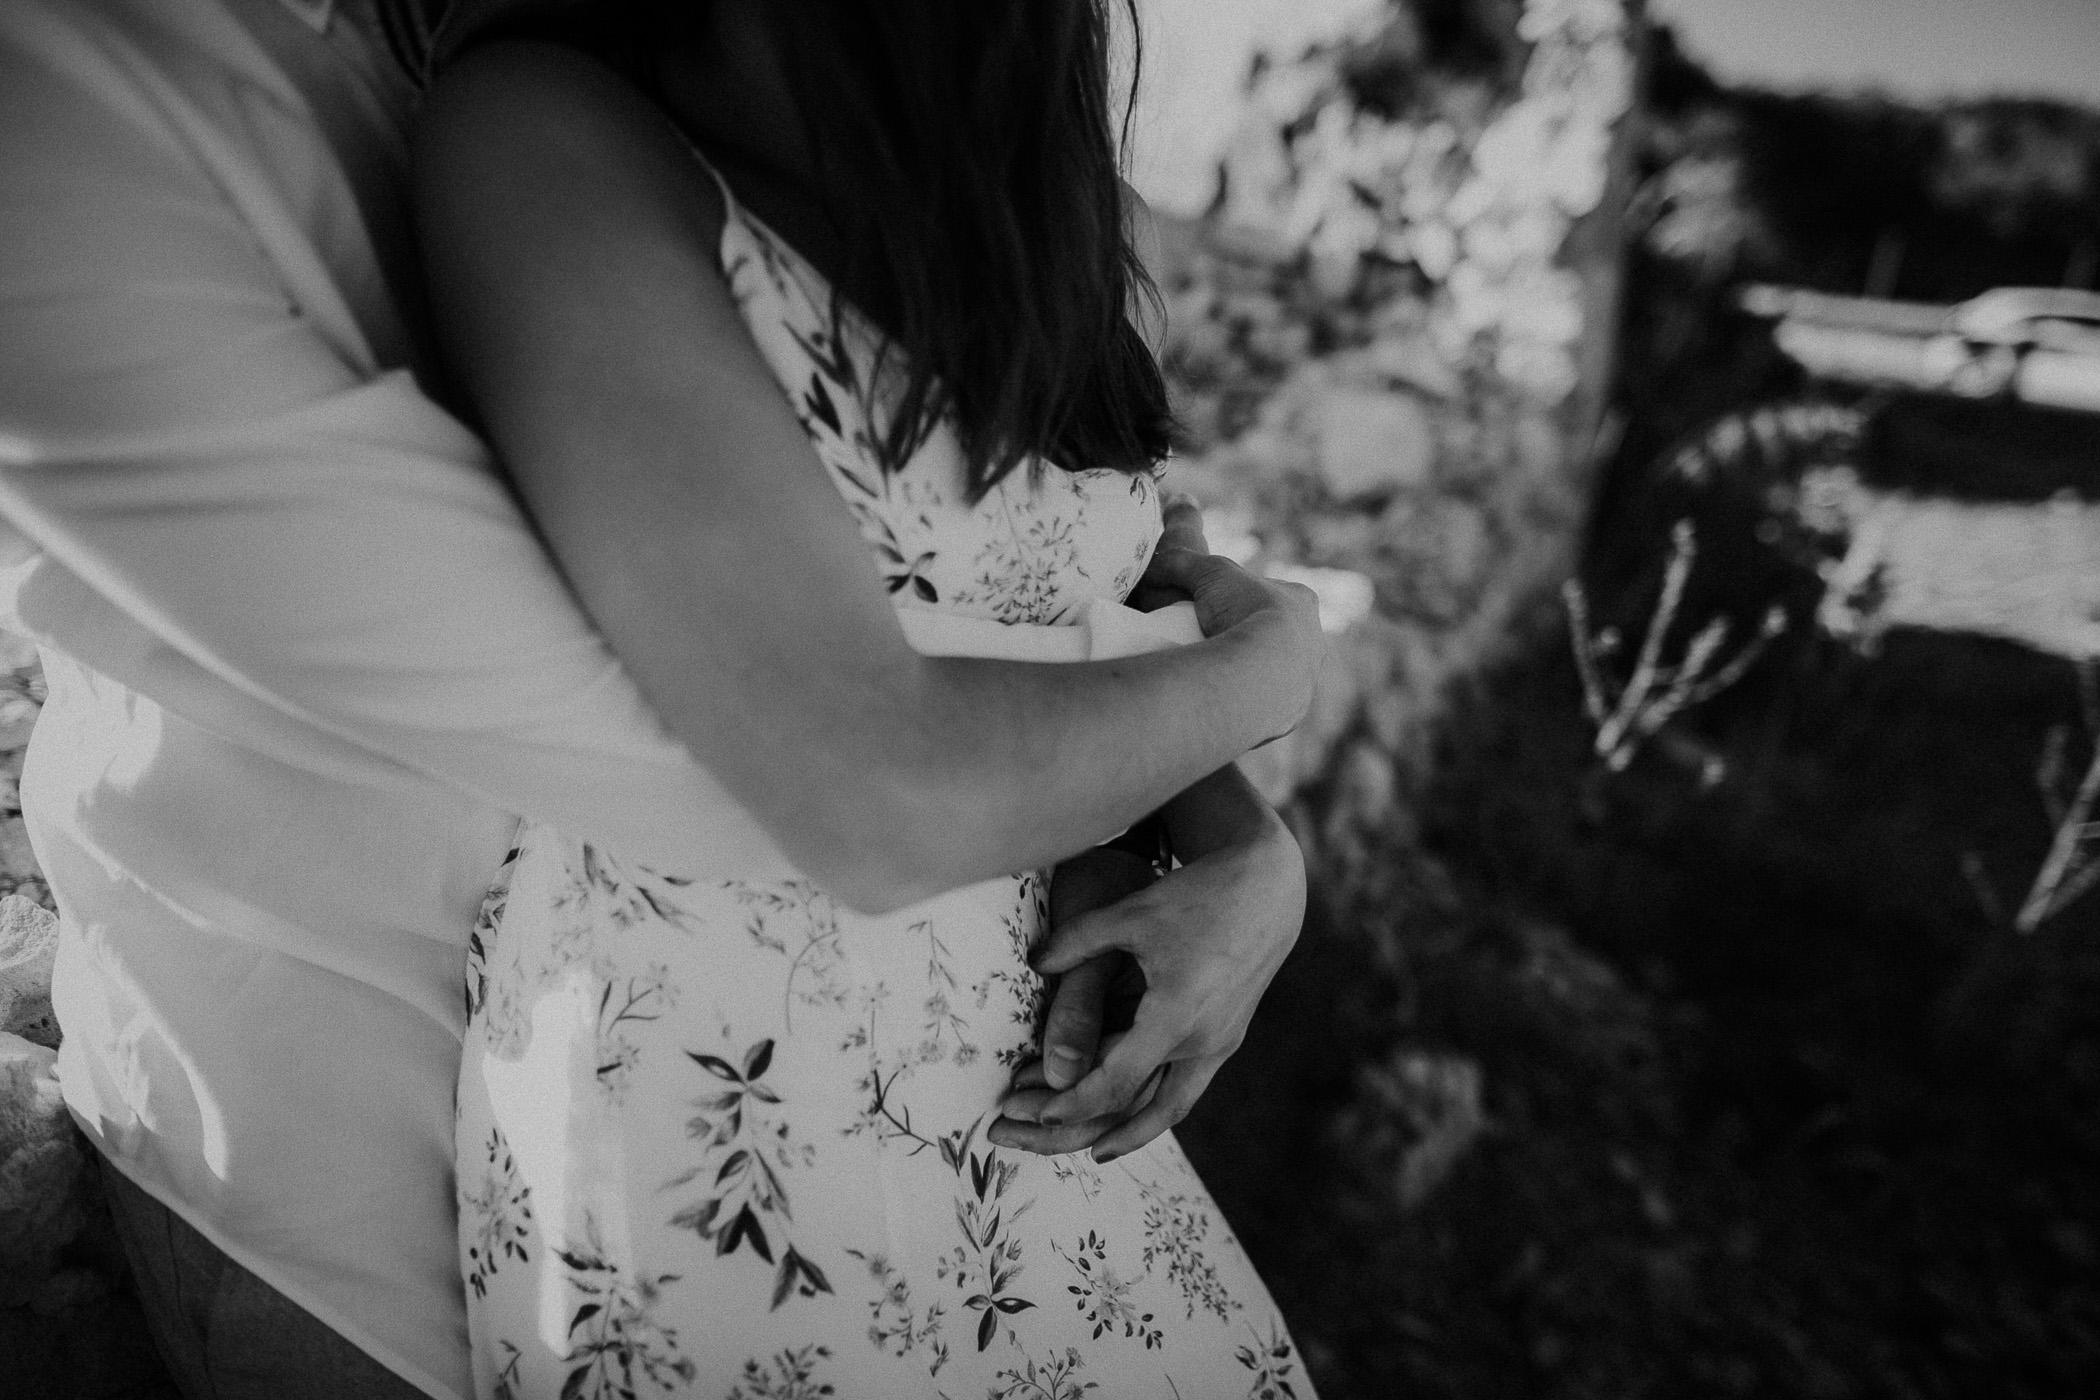 DanielaMarquardtPhotography_wedding_elopement_mallorca_spain_calapi_palma_lauraandtoni_389